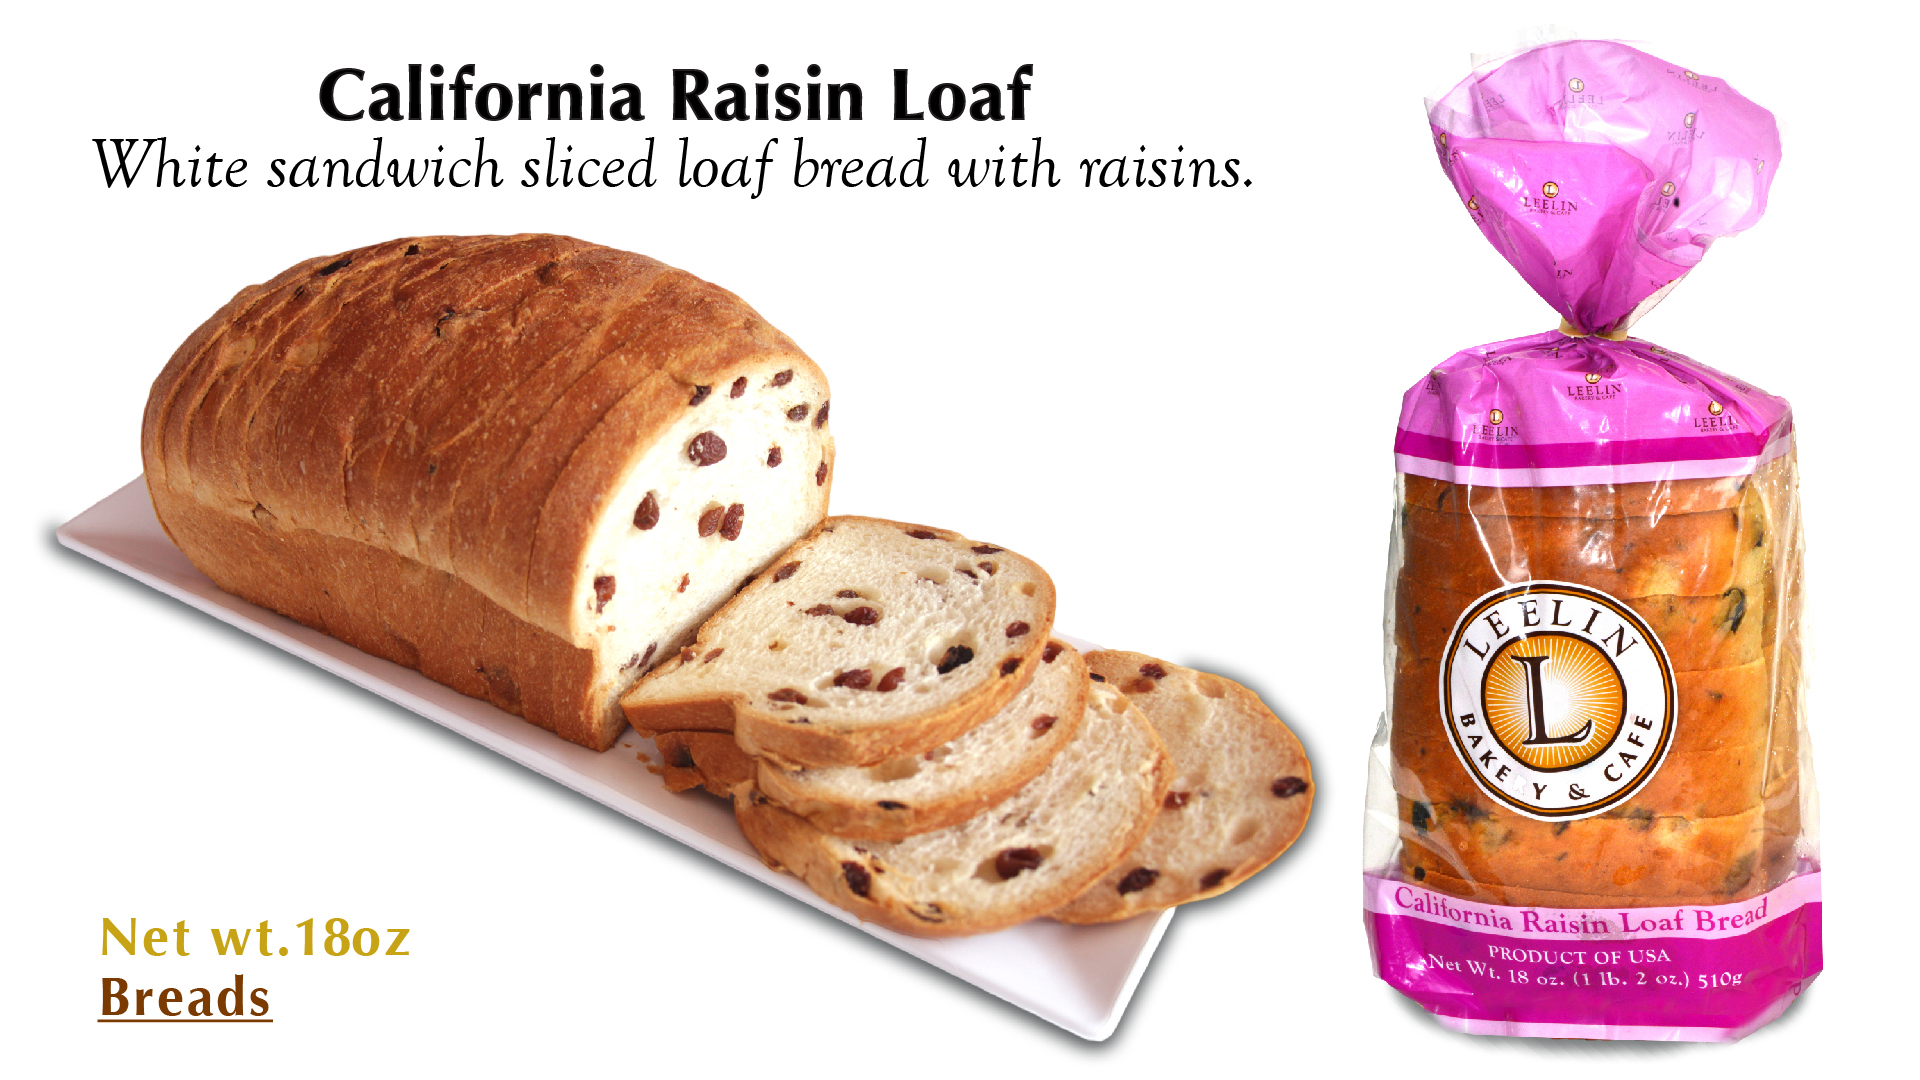 009 California Raisin Loaf Bread 1920x1080.jpg